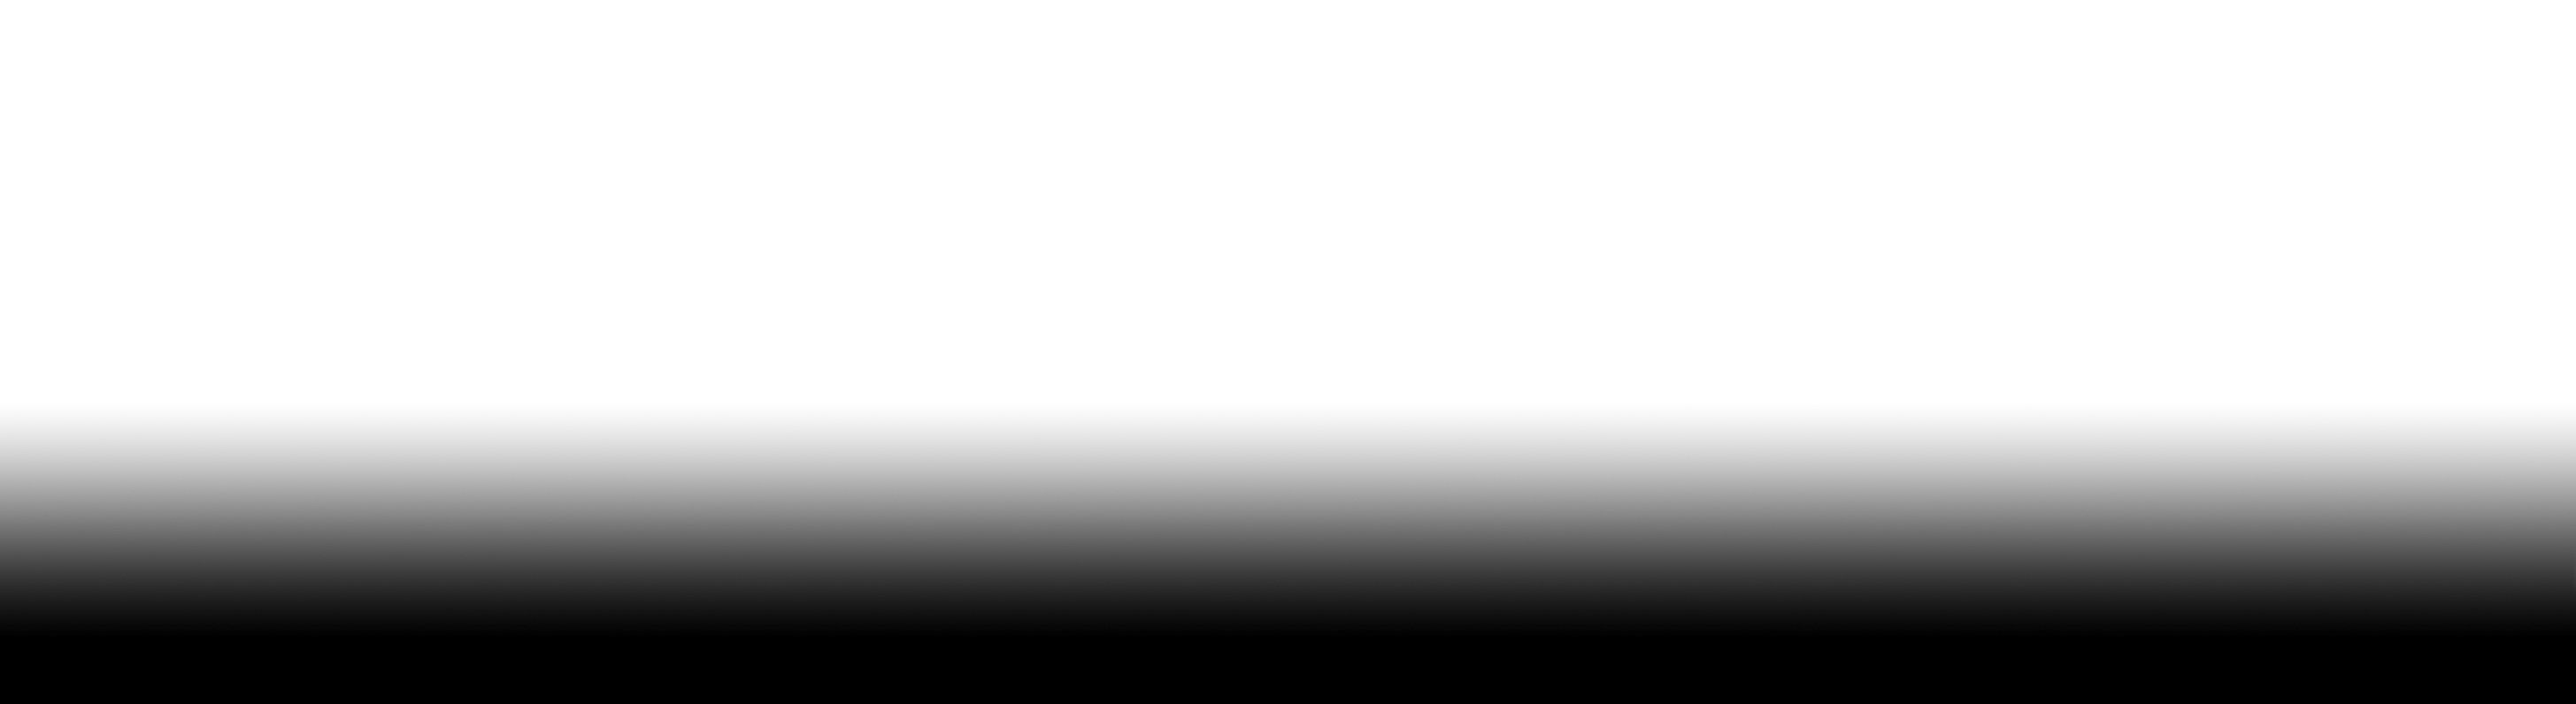 slider-urnaut1.png